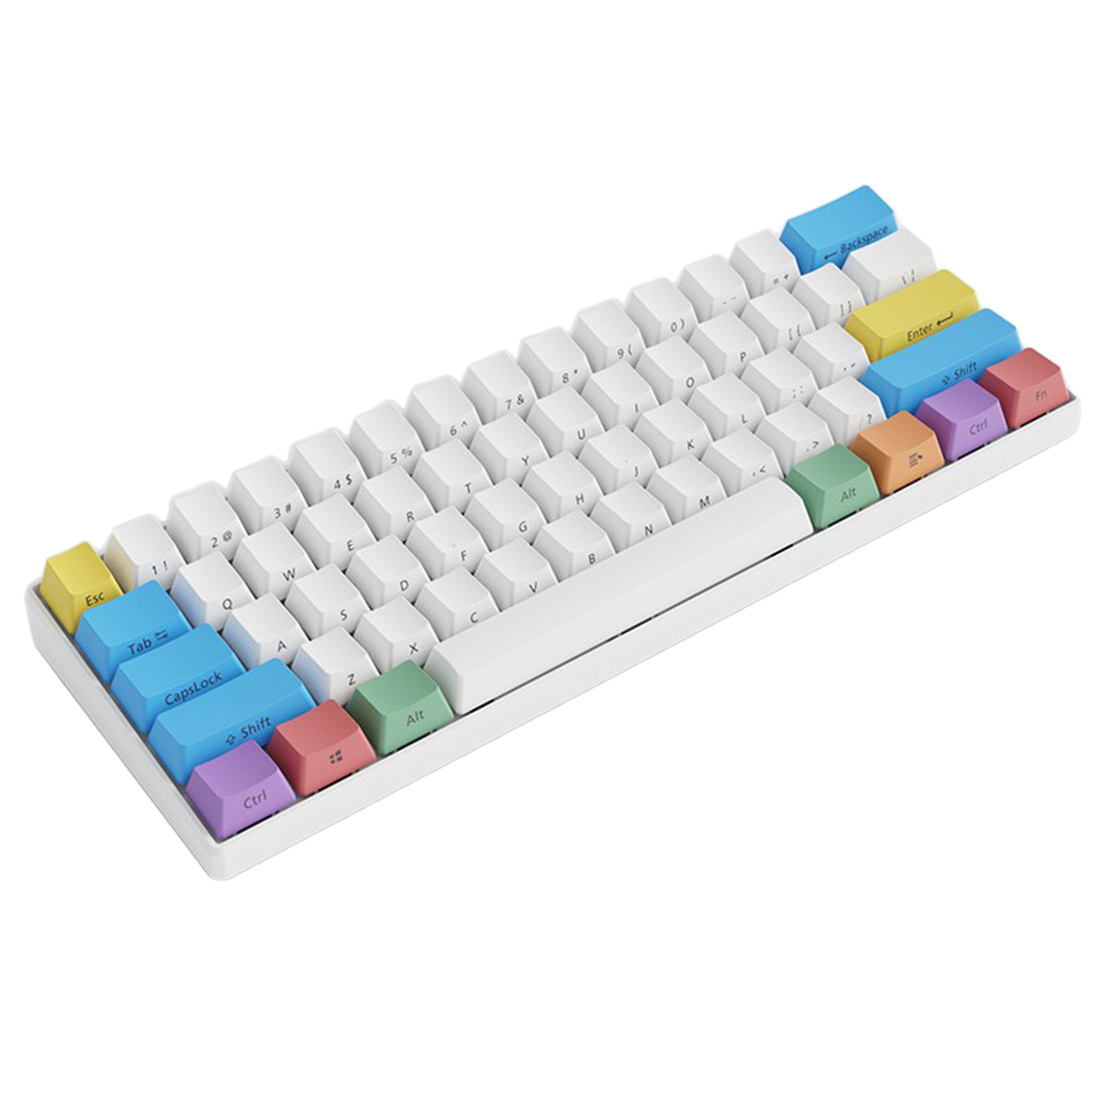 61 Keys PBT Keycaps Wireless Bluetooth Ultra-Compact 60% Mechanical Gaming Keyboard for Windows/Ios/Andoid